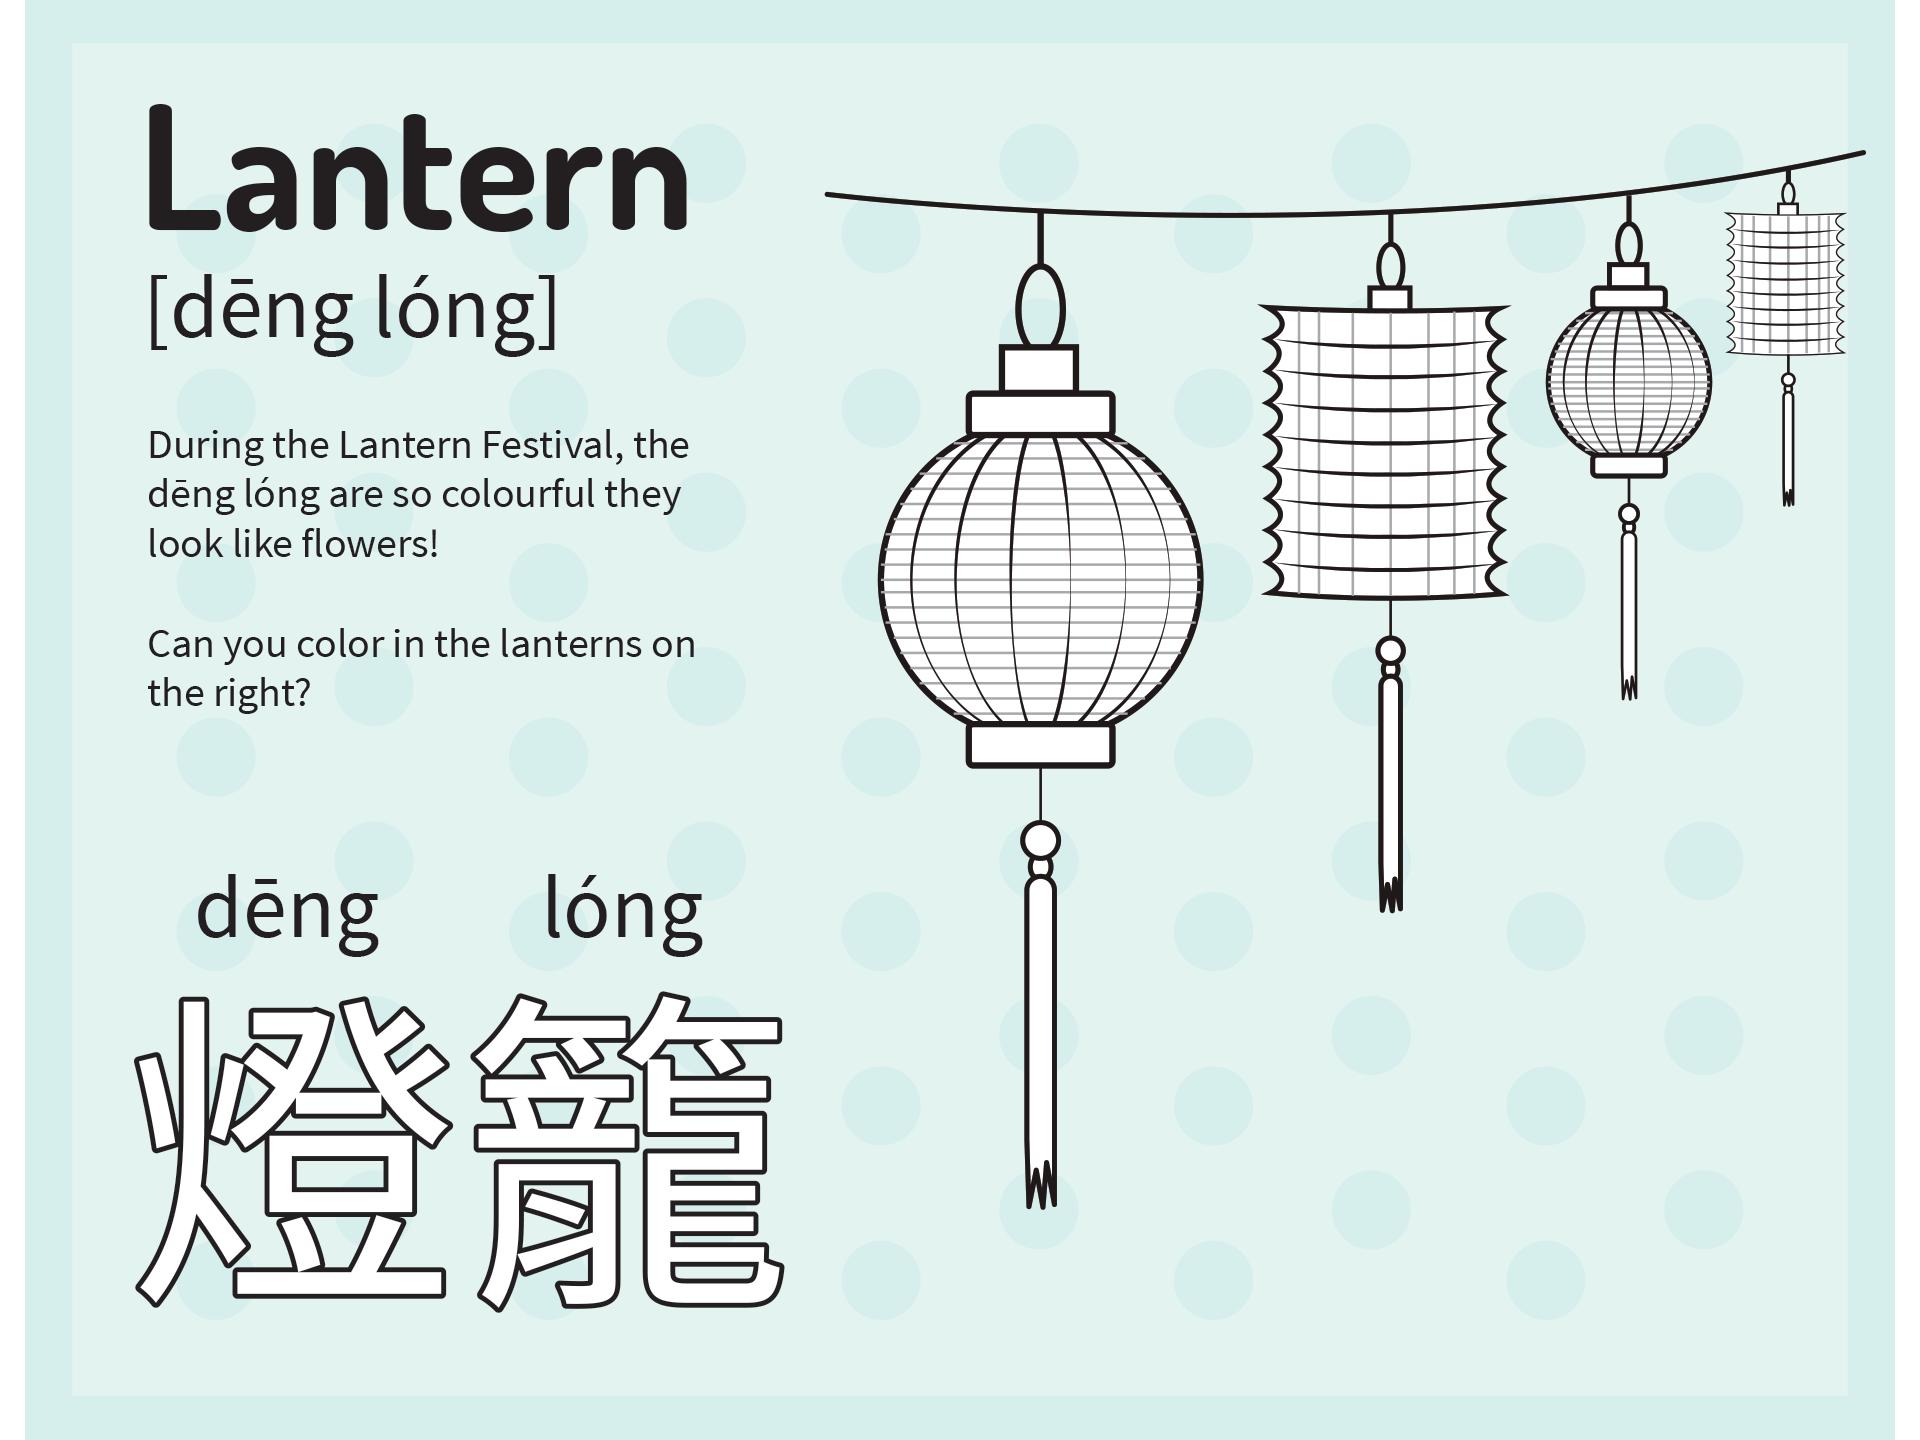 Printable Activity Sheet Lantern Learn Chinese Printable Activities Chinese Lantern Festival [ 1440 x 1920 Pixel ]